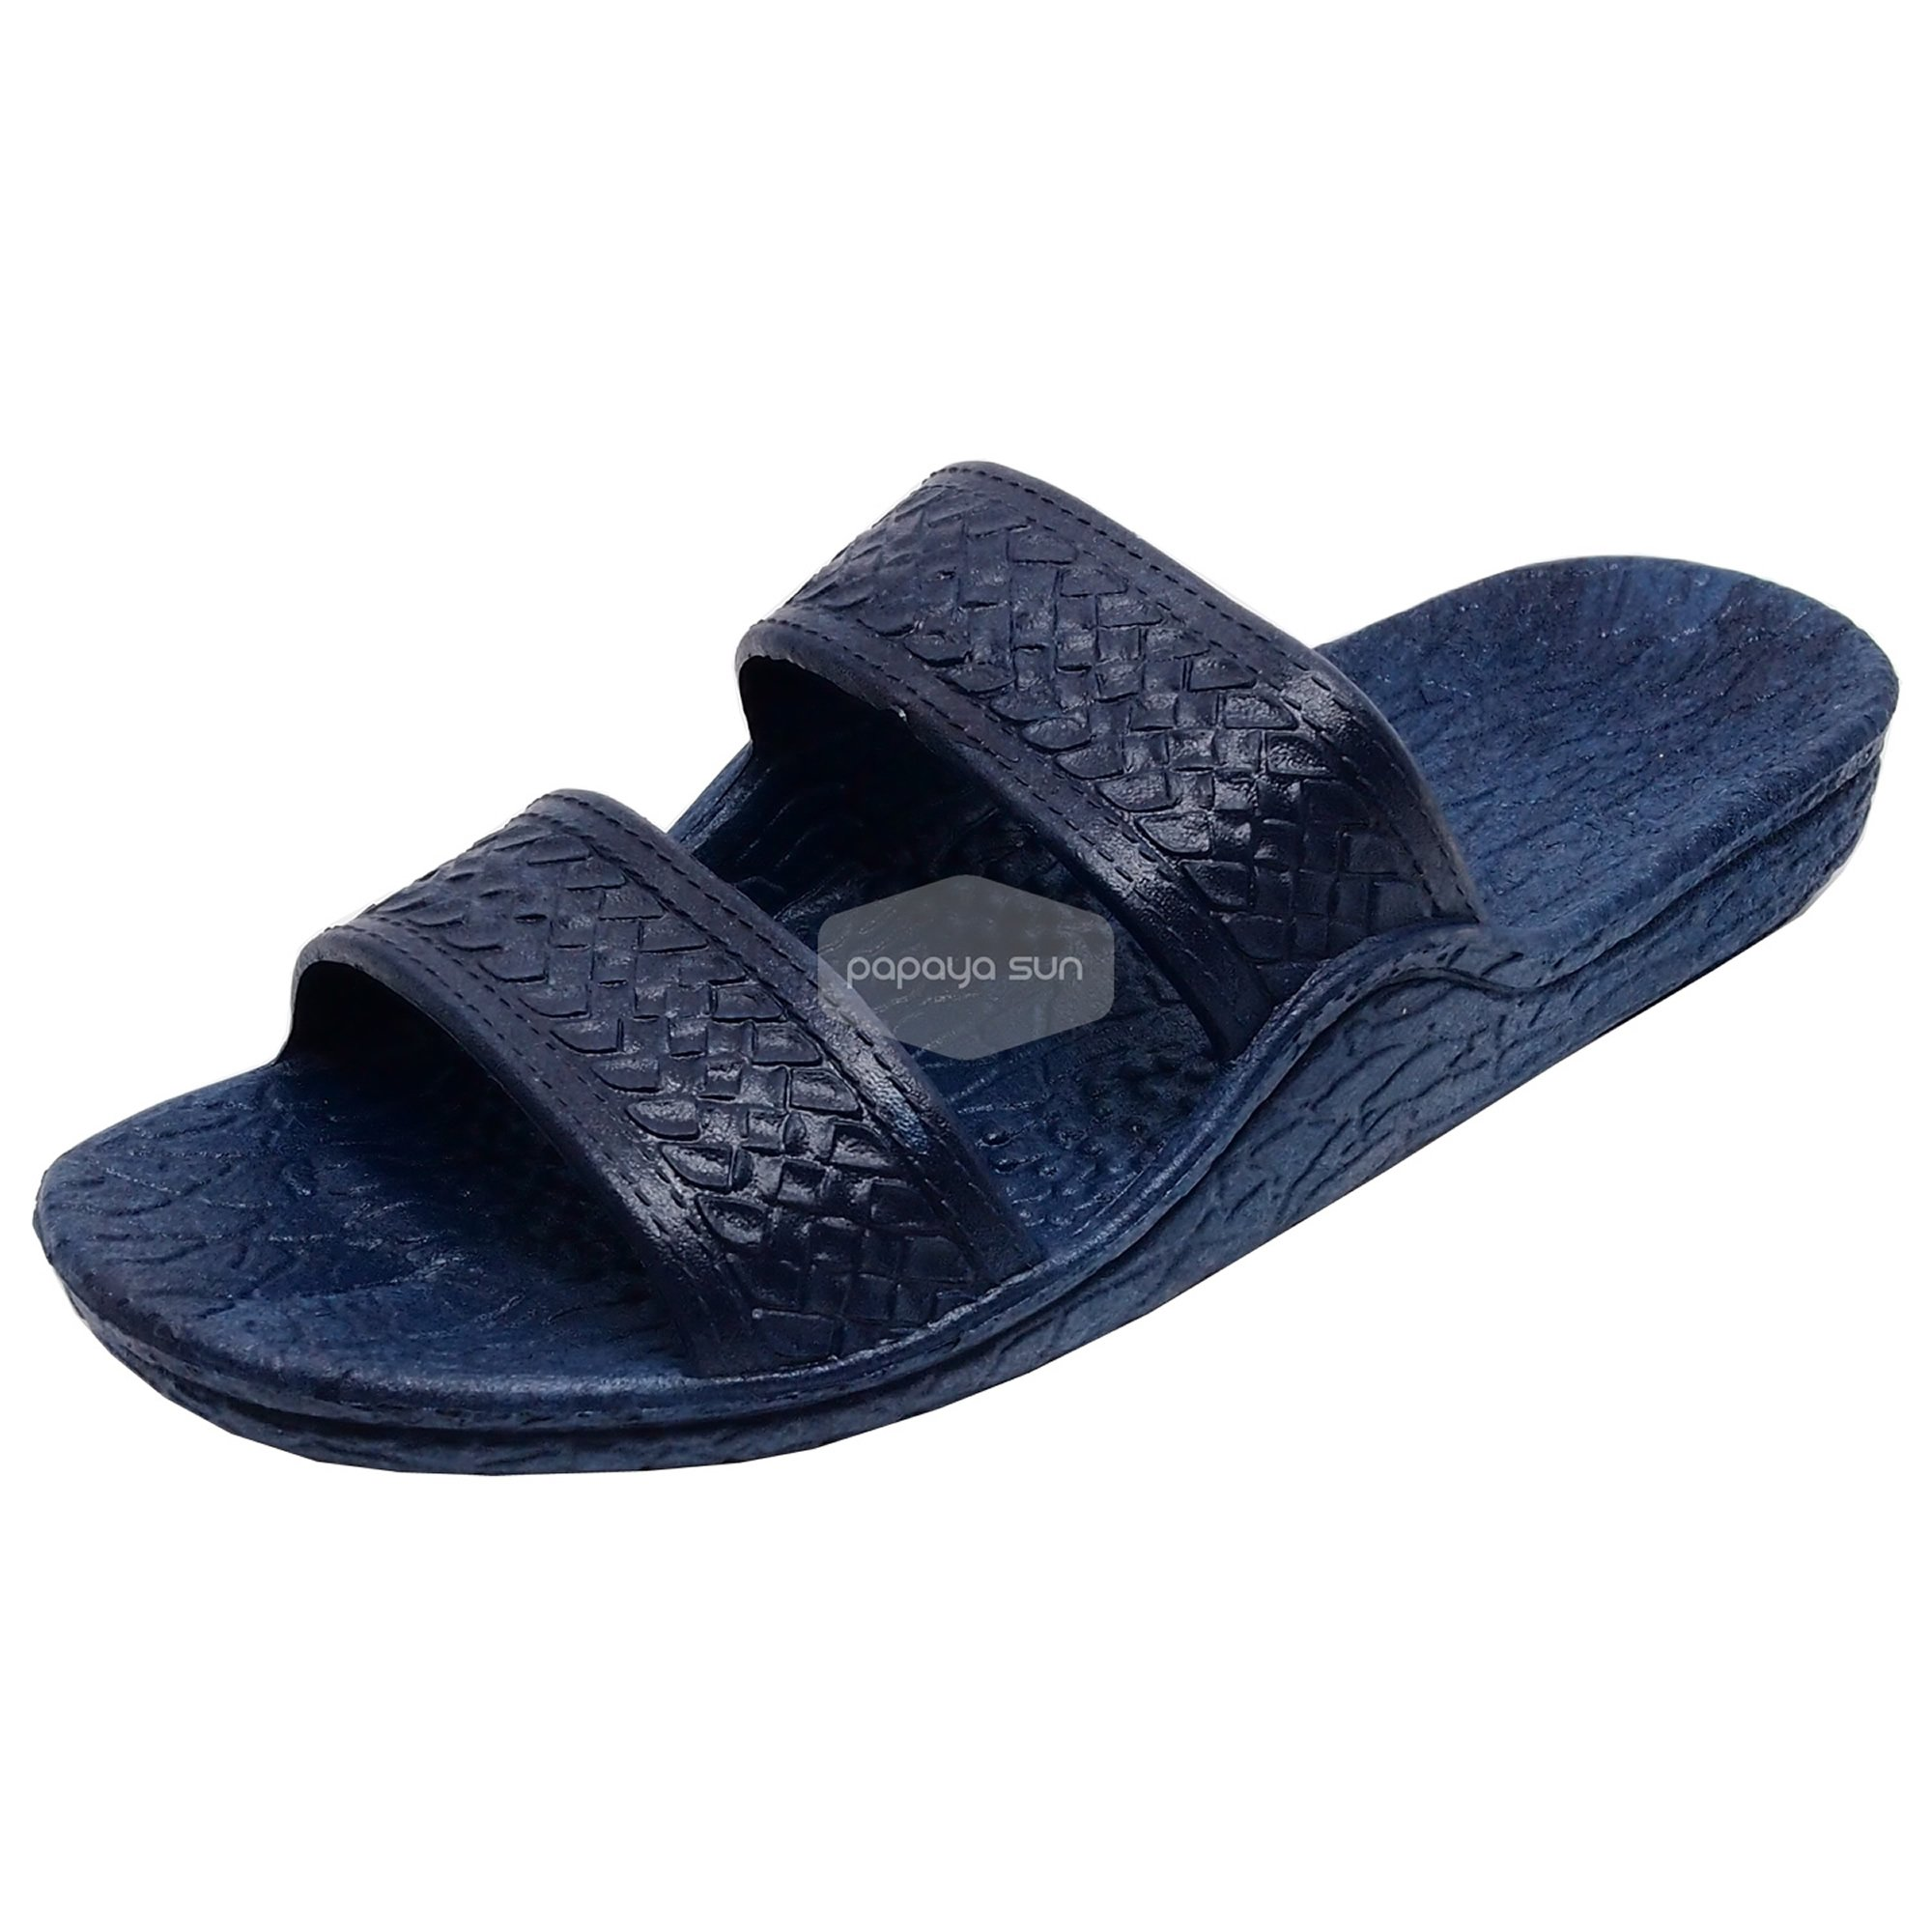 a7726064ae575c Pali Hawaii - Pali Hawaii Navy Jesus Hawaiian Sandals Jandals - Walmart.com